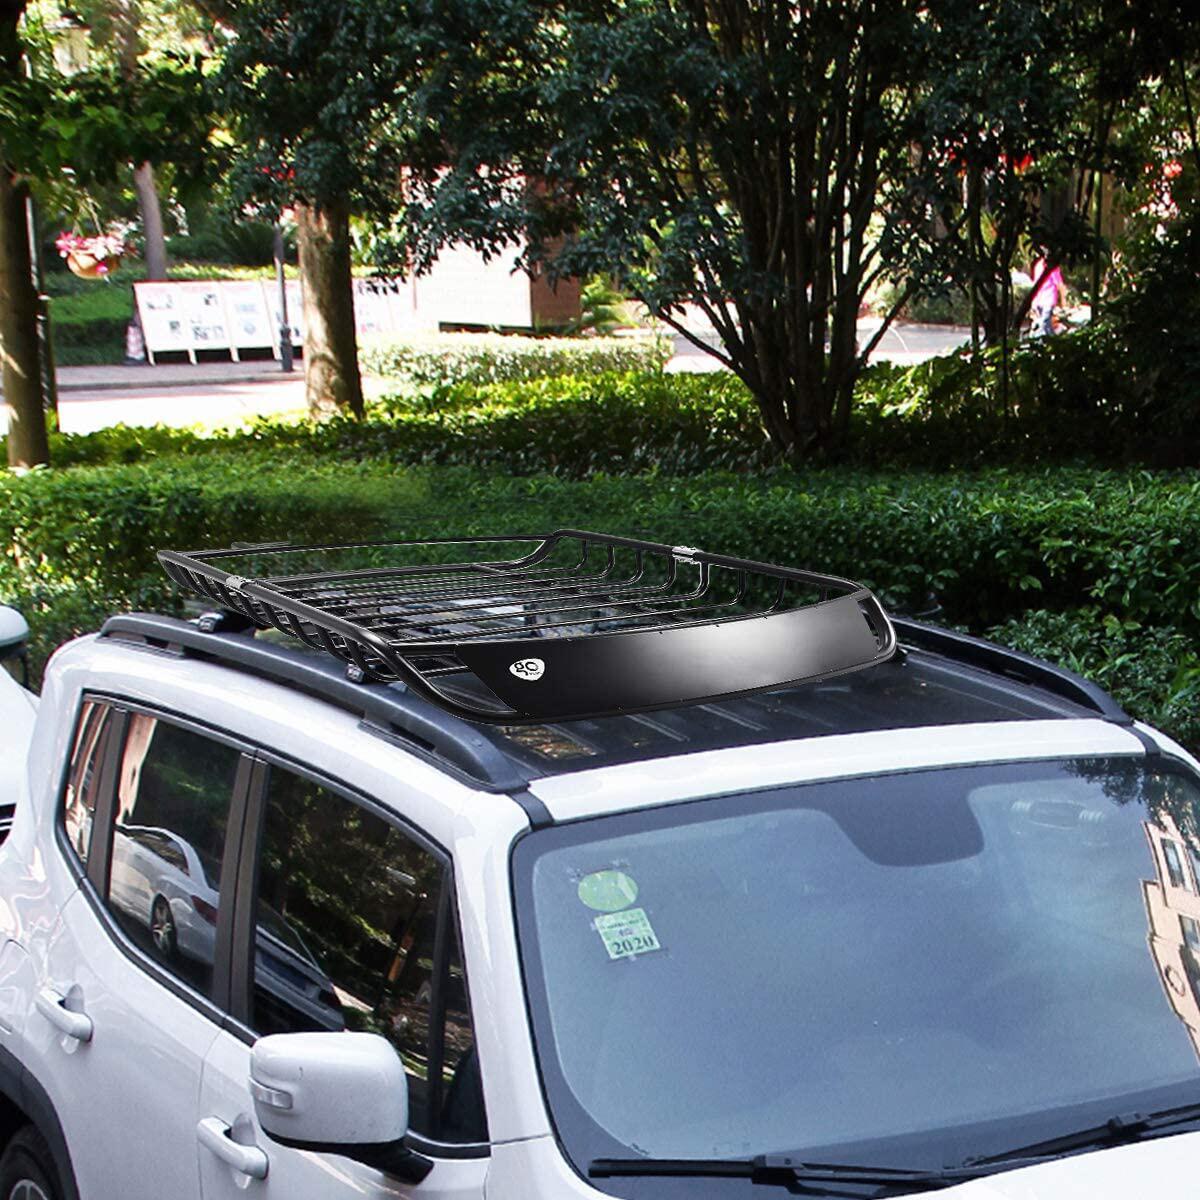 Bild zu auto, urlaub, corona, gepäck, familie, ferien, dachbox, fahrradträger, sommerferien